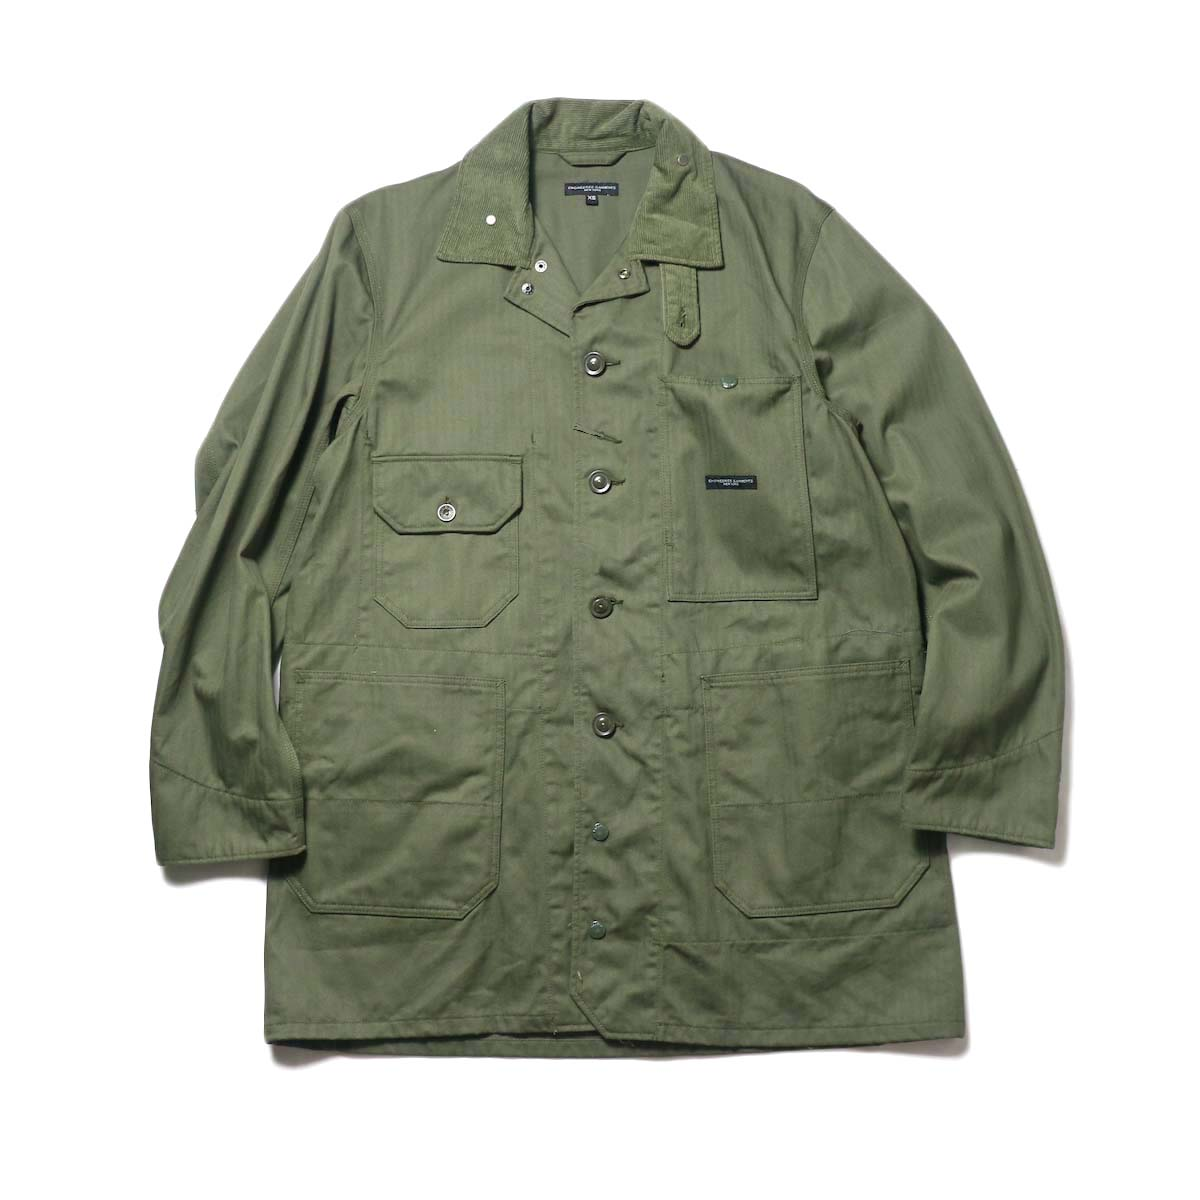 Engineered Garments / Long Logger Jacket -Hb Twill (Olive)